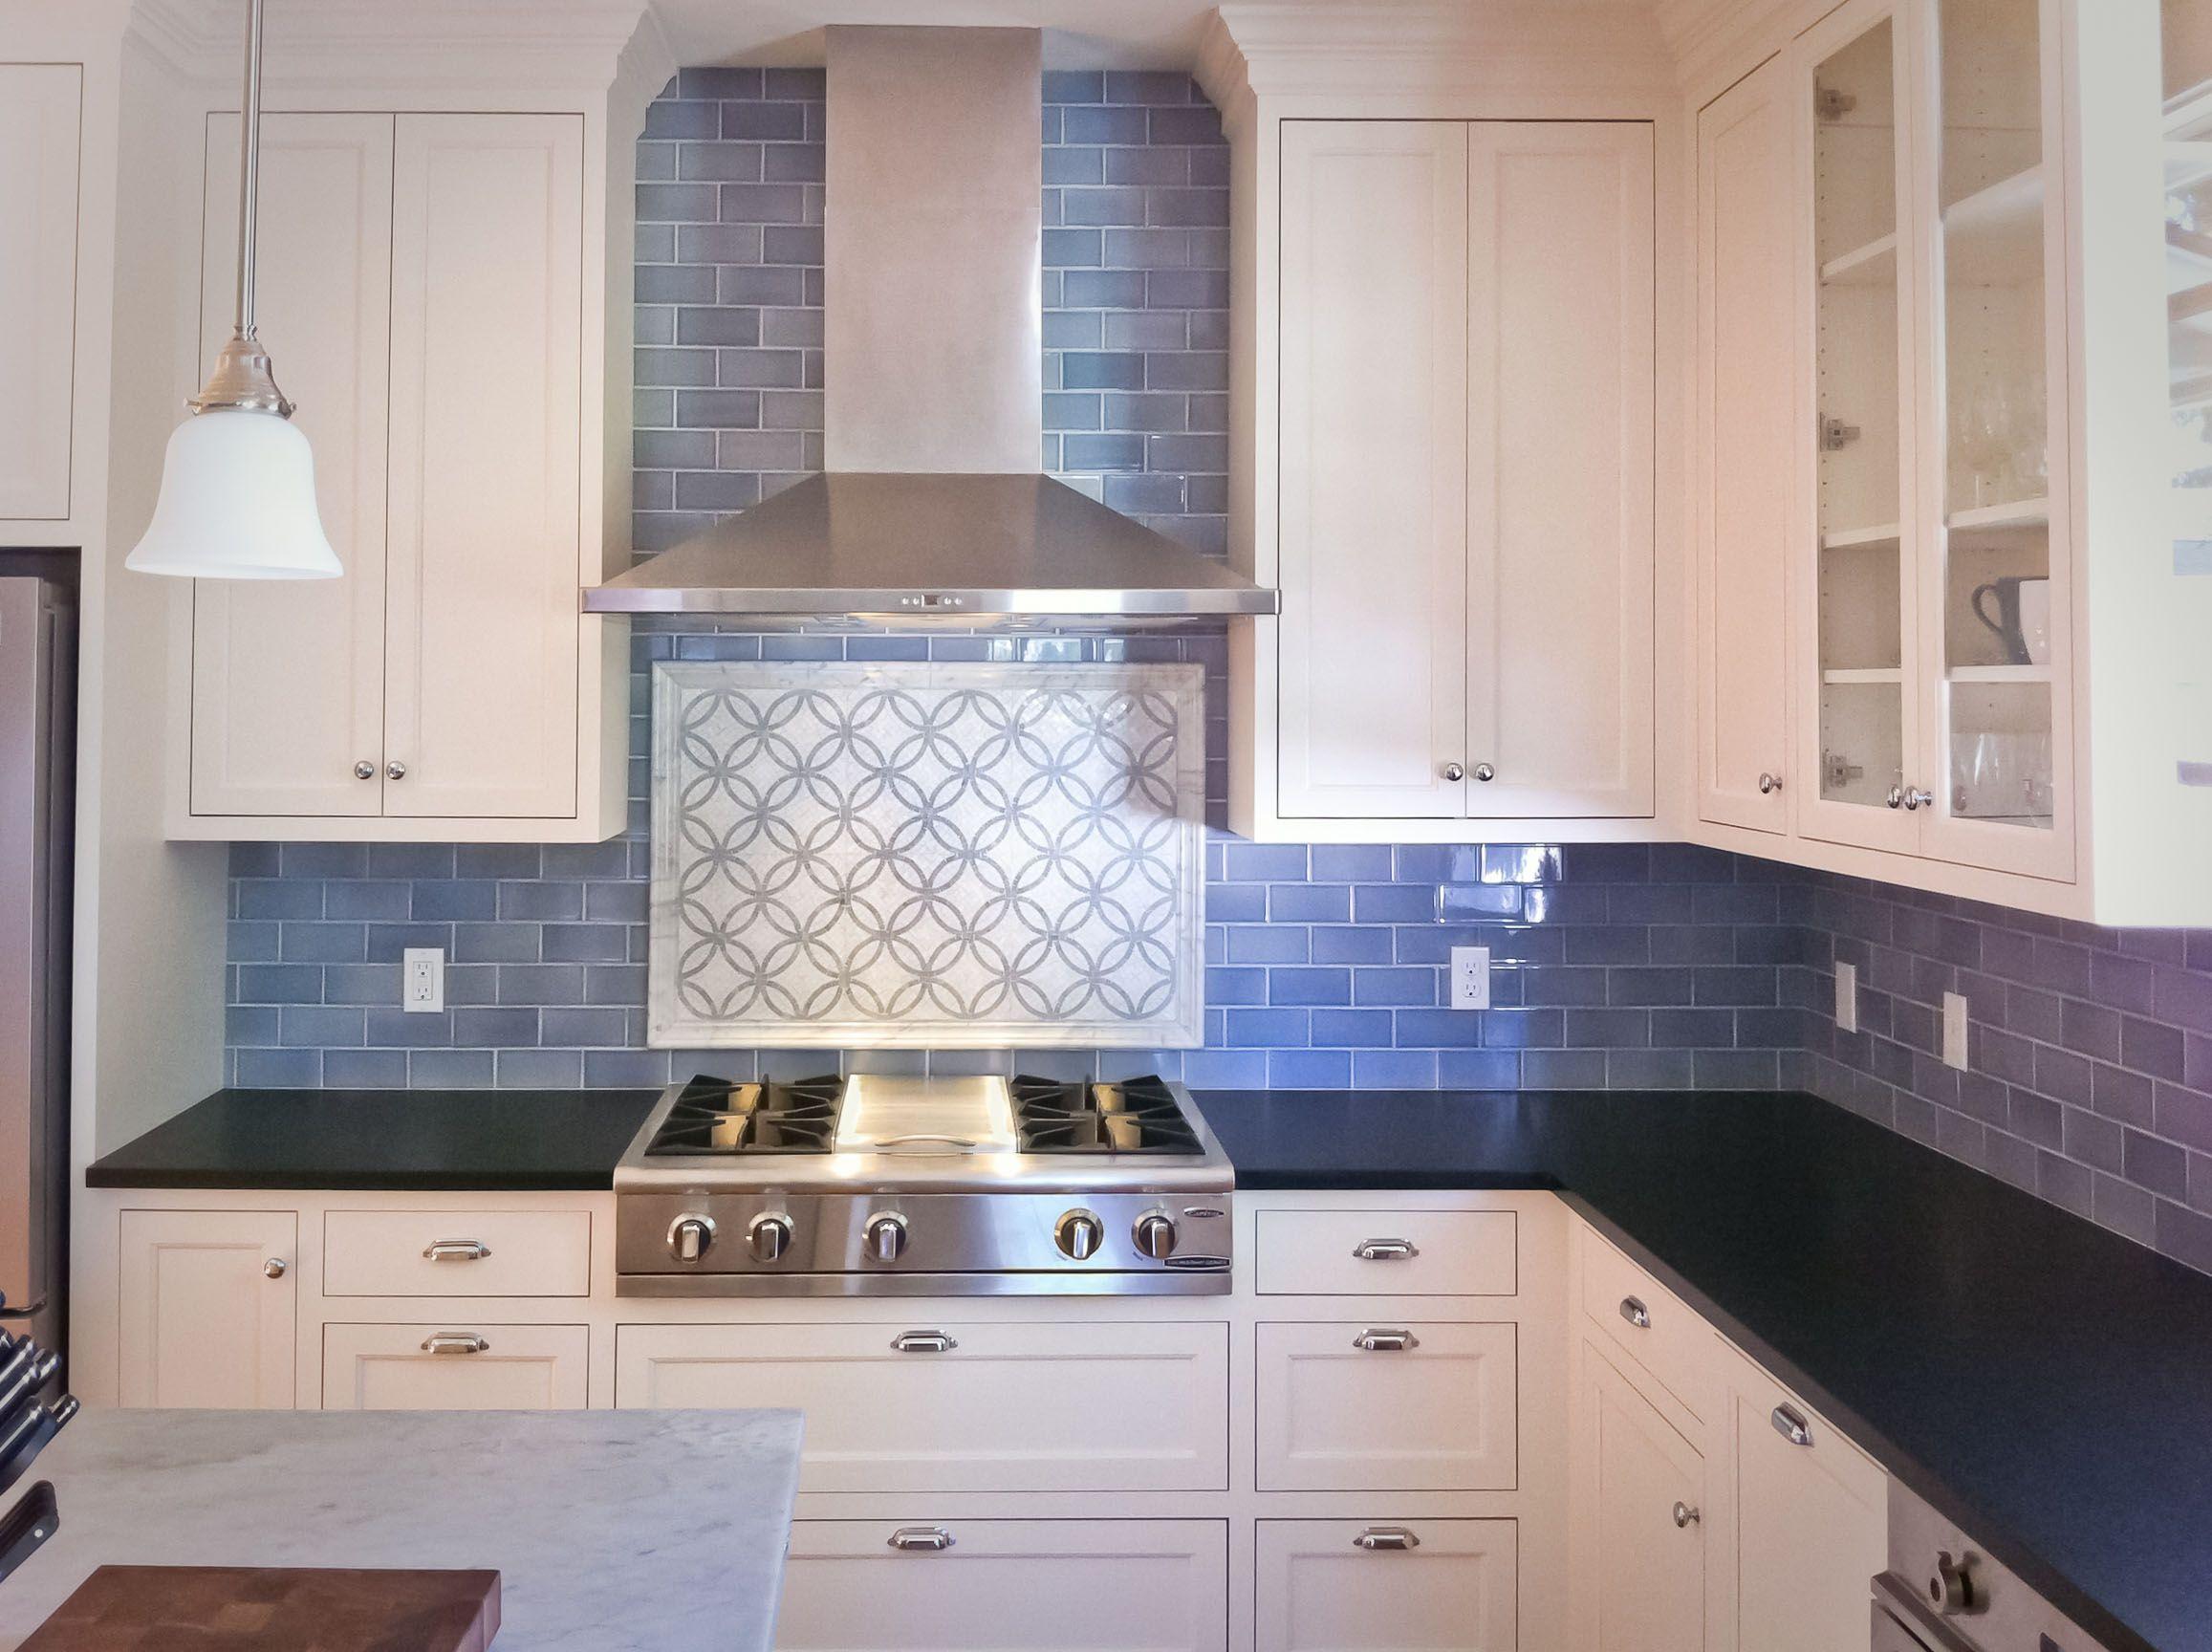 backsplash for kitchen backsplash tiles for kitchen Projects Smithcraft Fine Construction